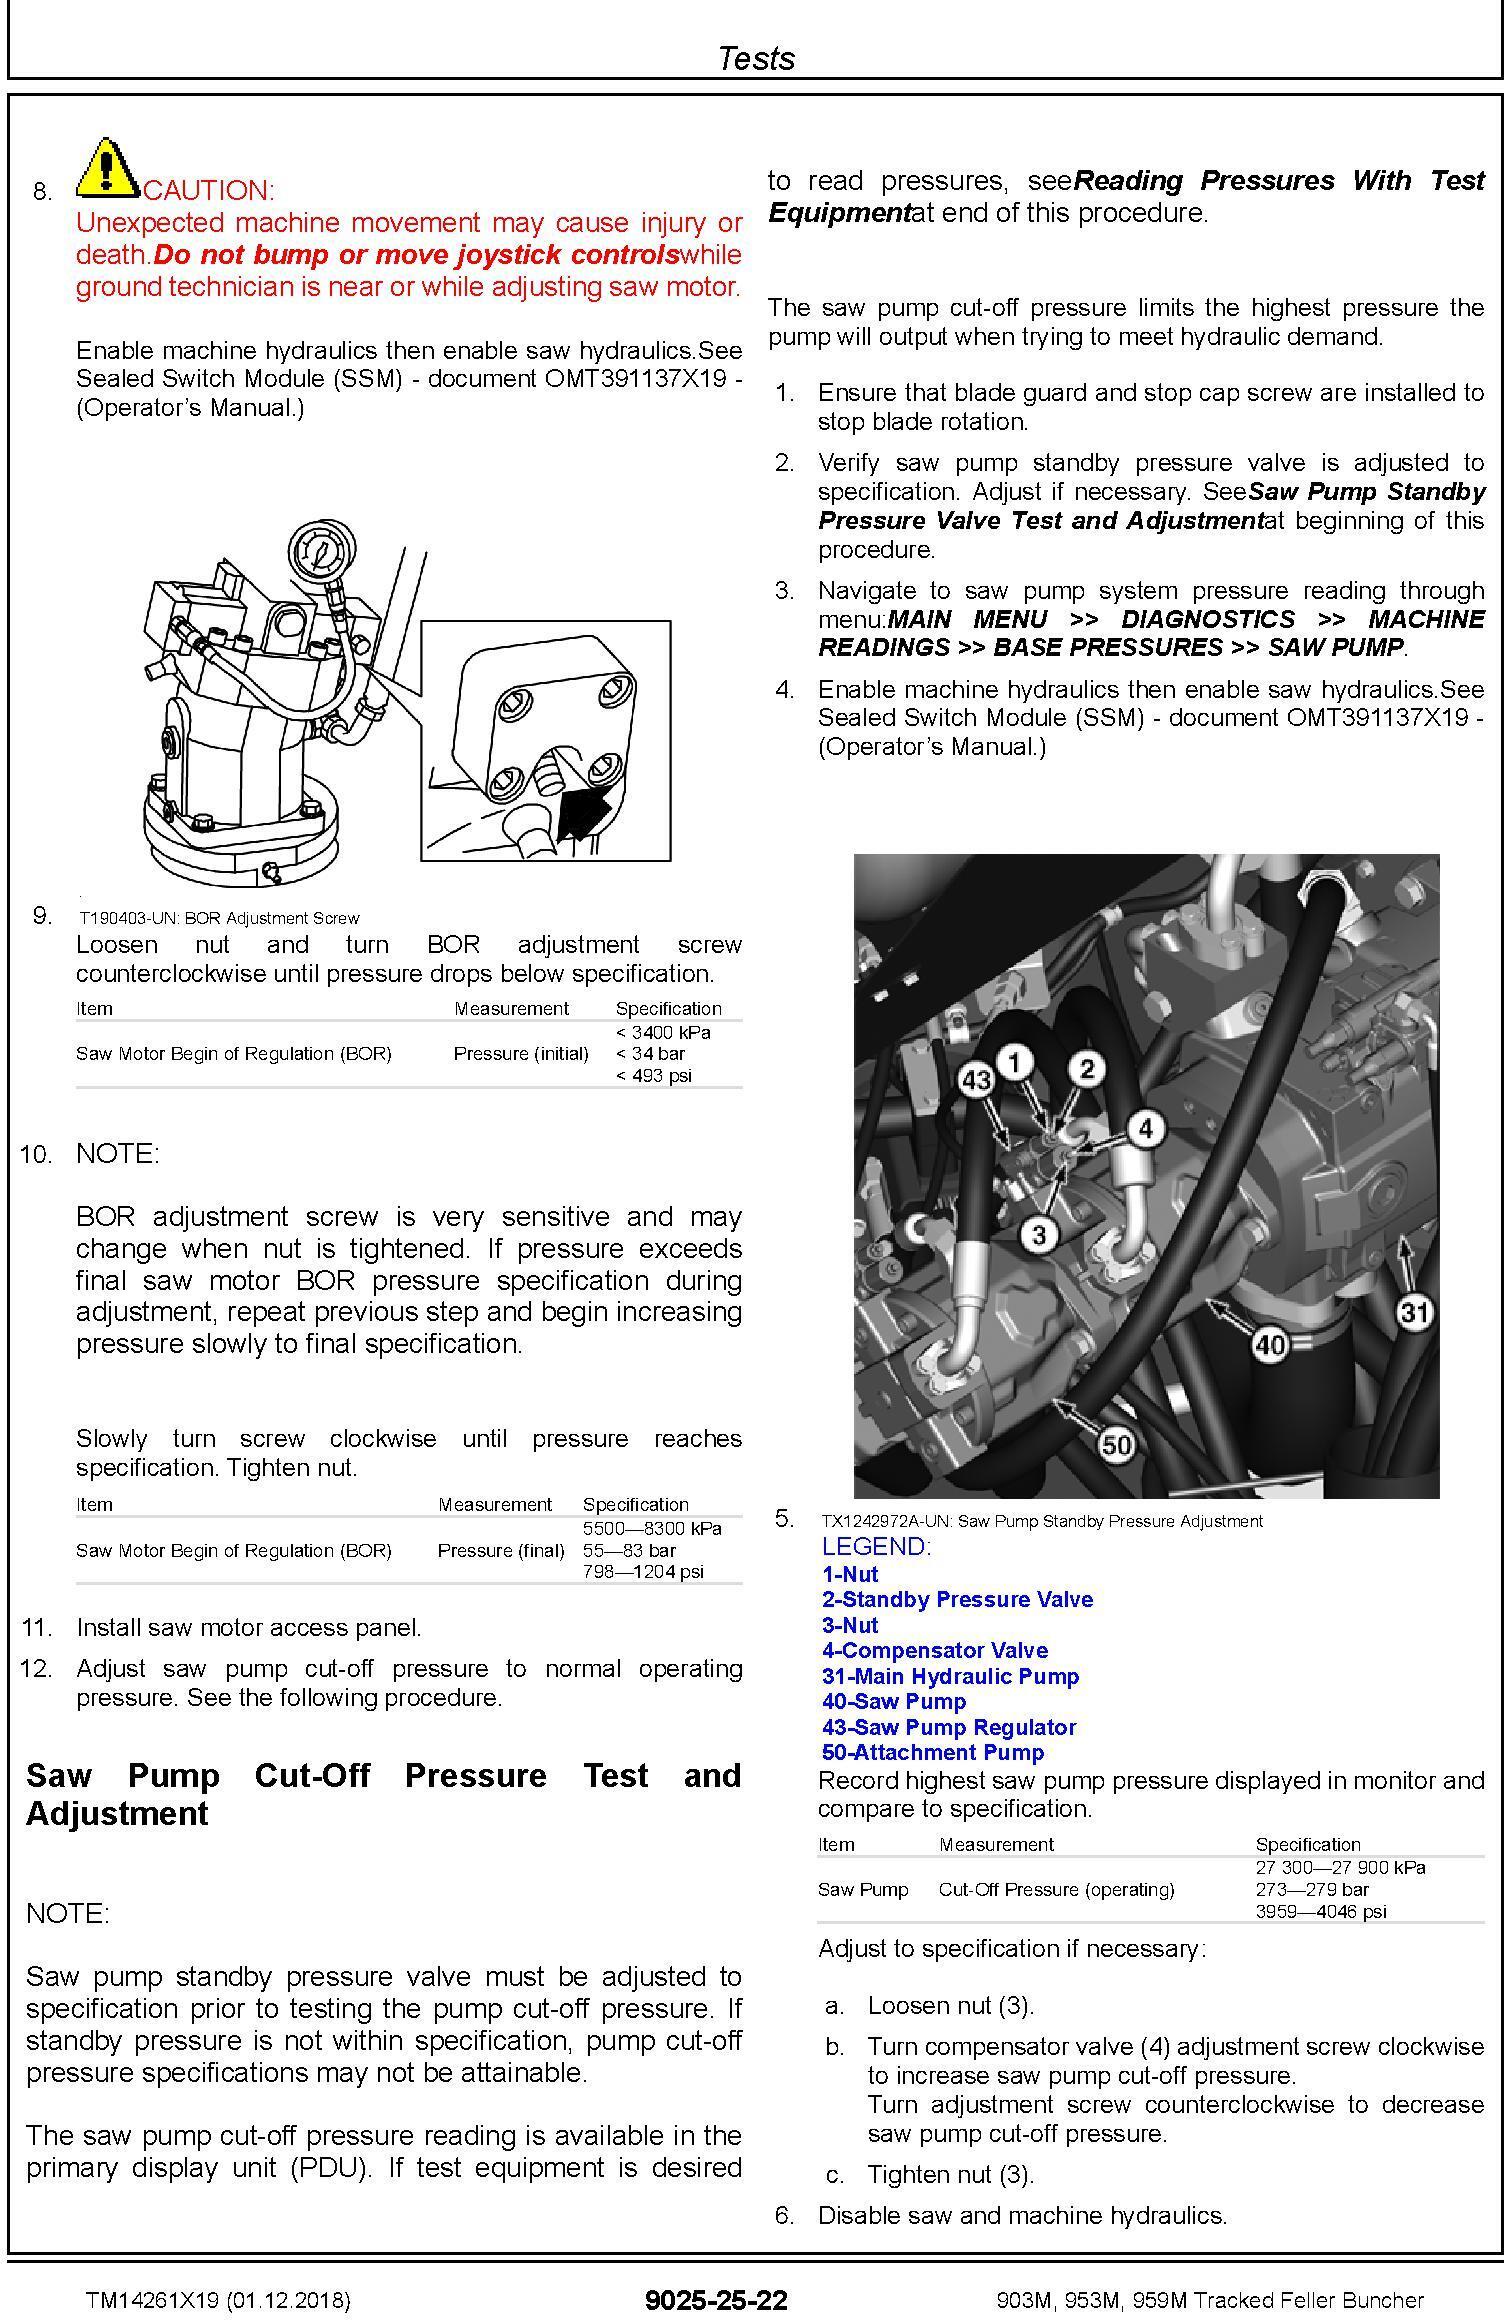 John Deere 903M, 953M, 959M (SN. F317982-, L317982-) Feller Buncher Diagnostic Manual (TM14261X19) - 3